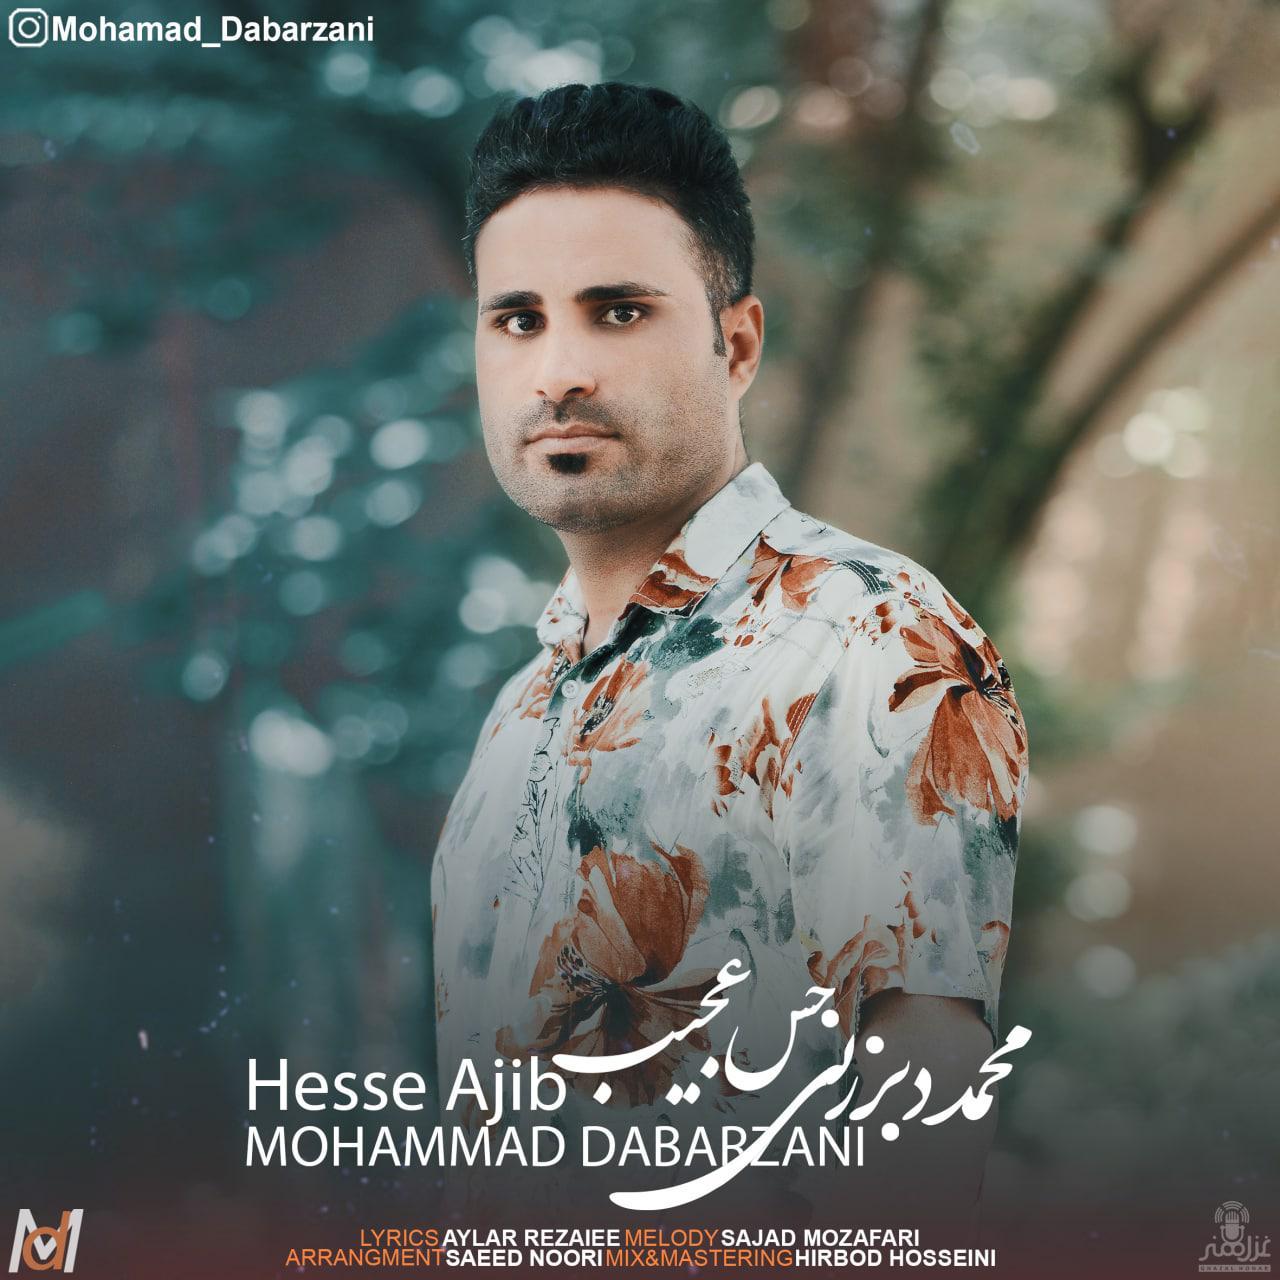 Mohammad Dabarzani – Hesse Ajib